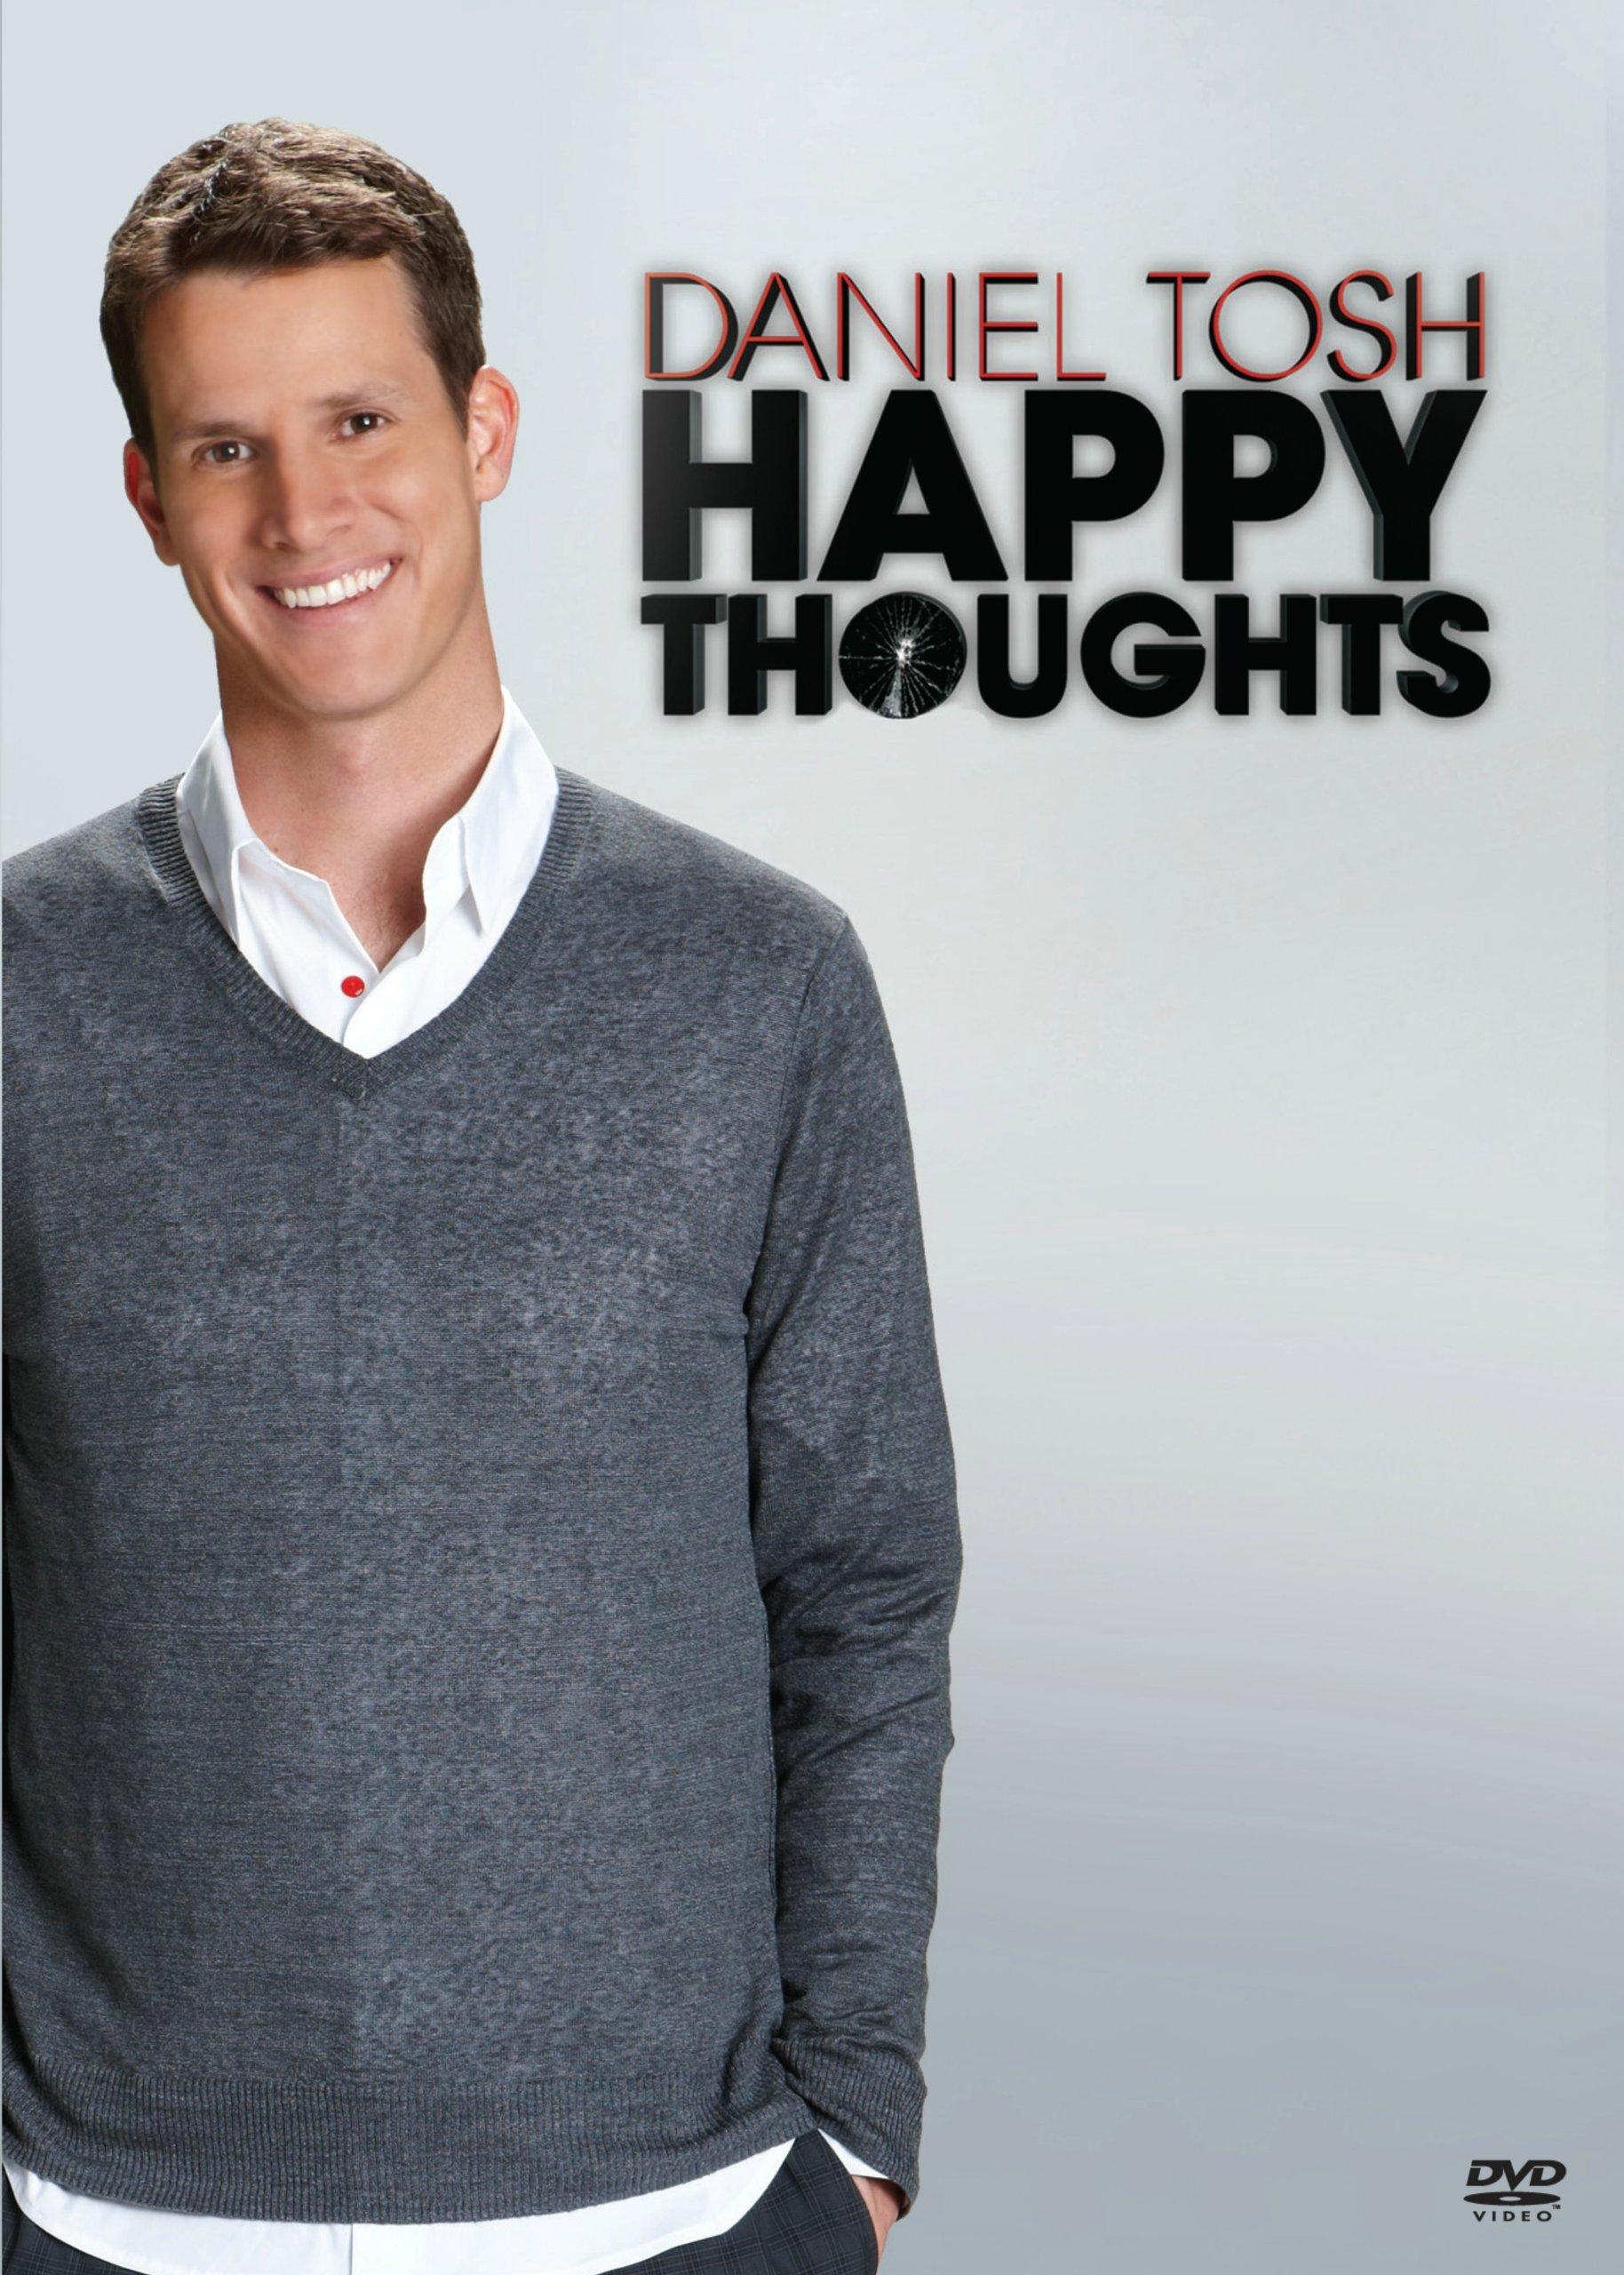 DVD : Jasper Redd - Daniel Tosh: Happy Thoughts (Widescreen, Dolby, AC-3)